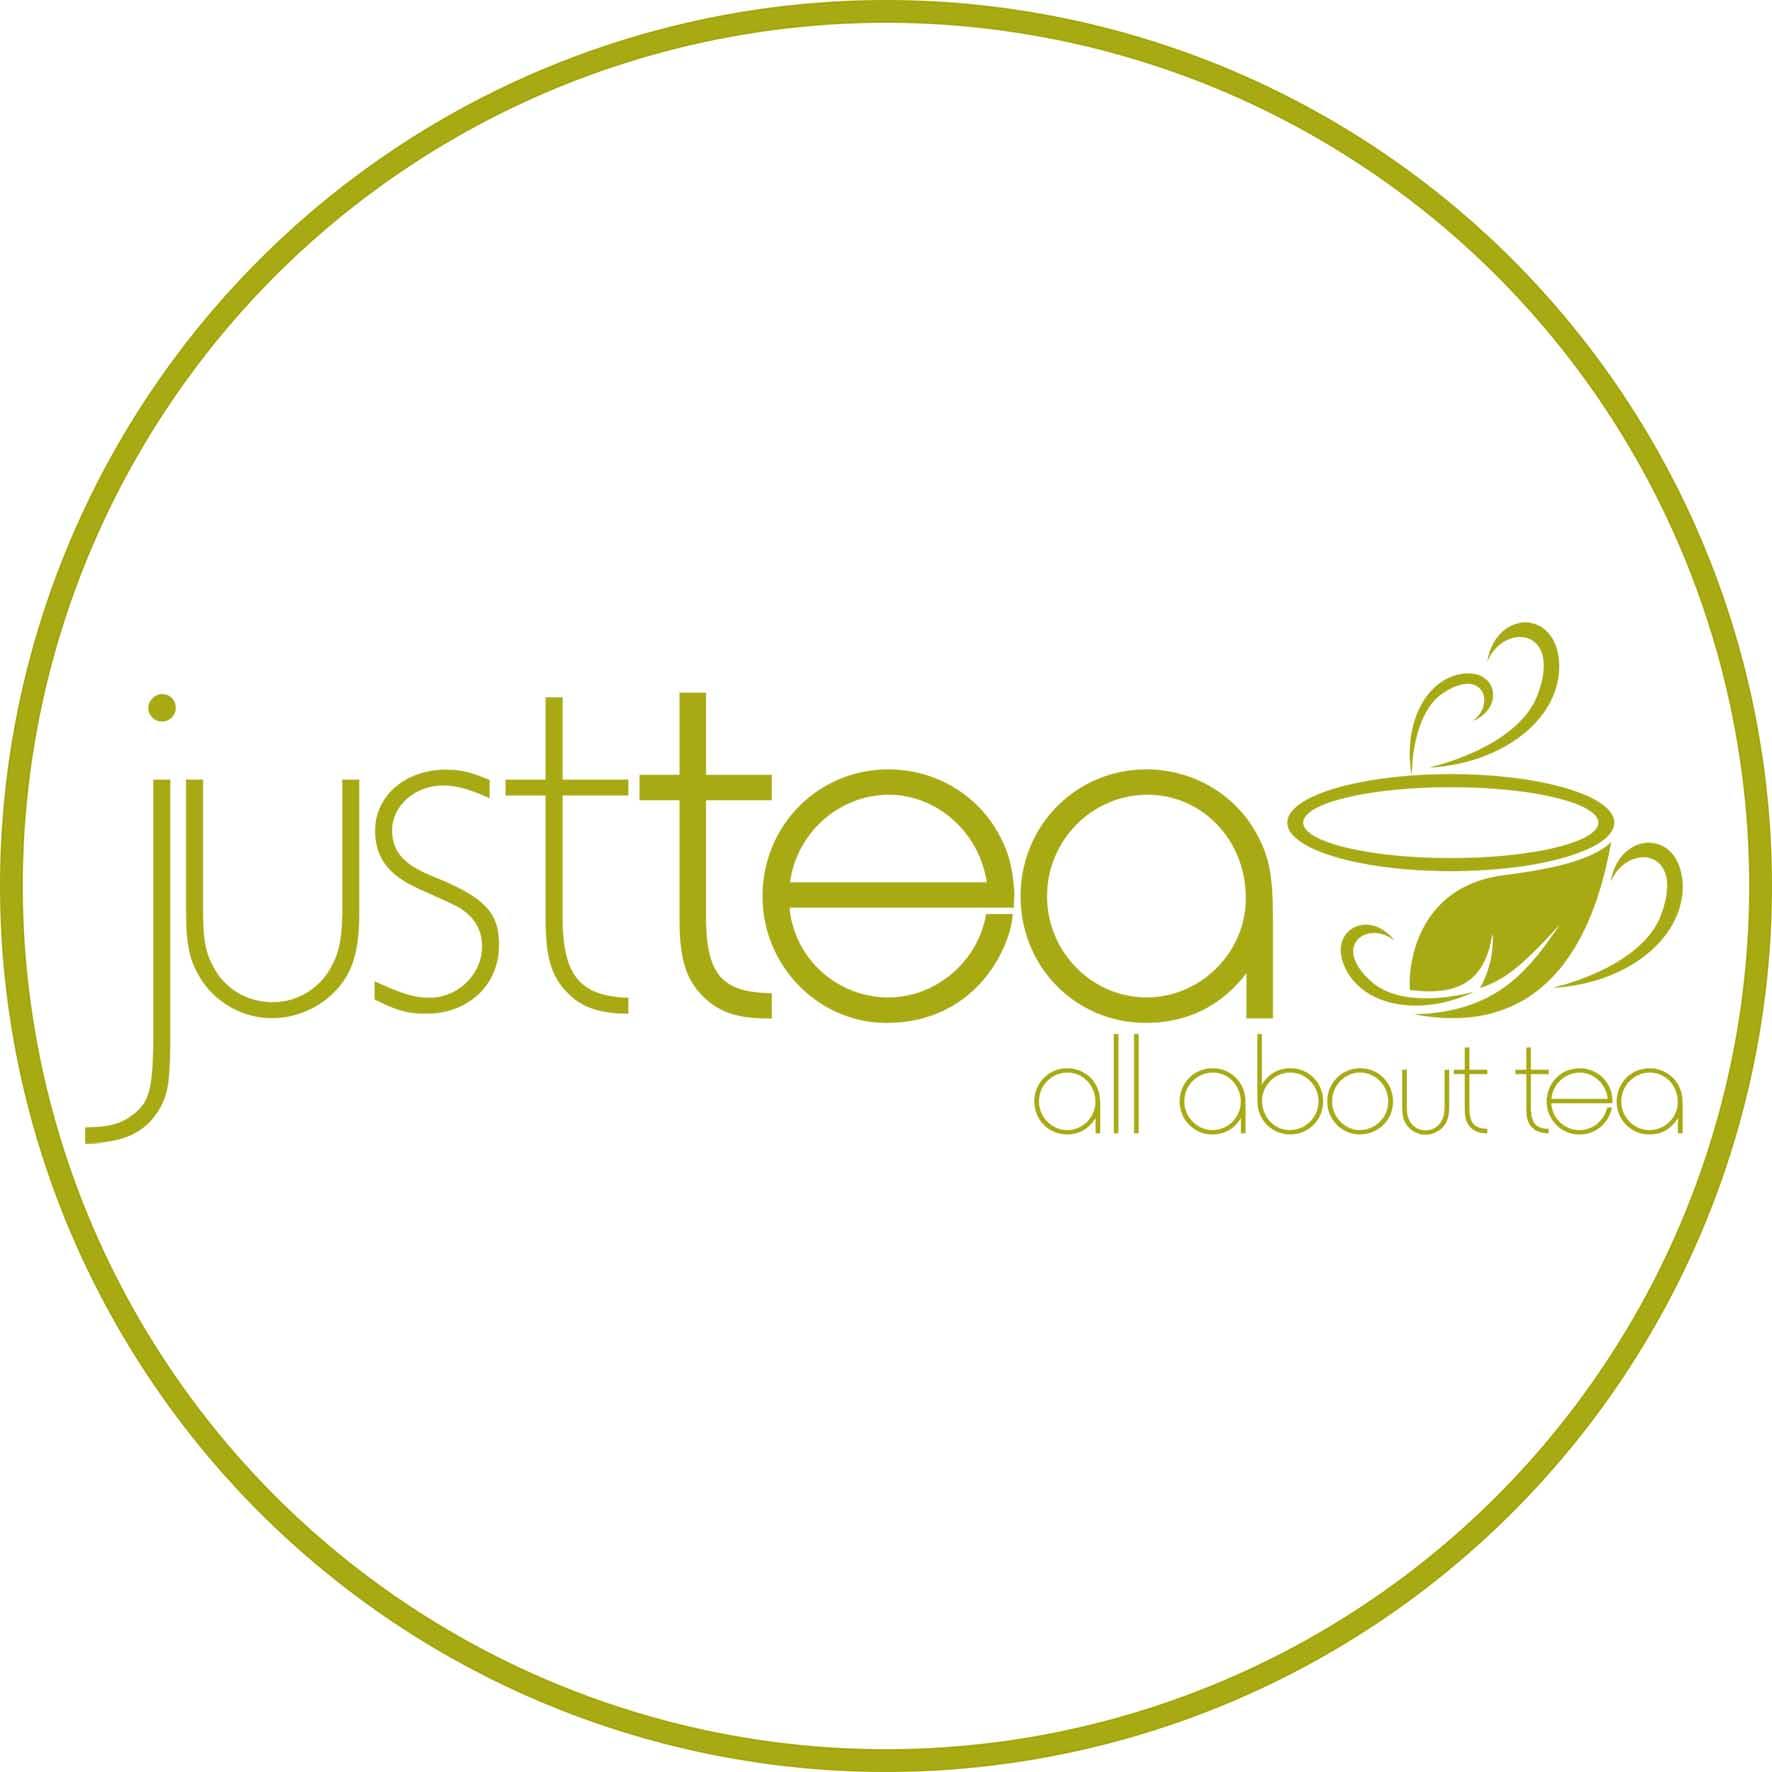 logo_just_tea_saco